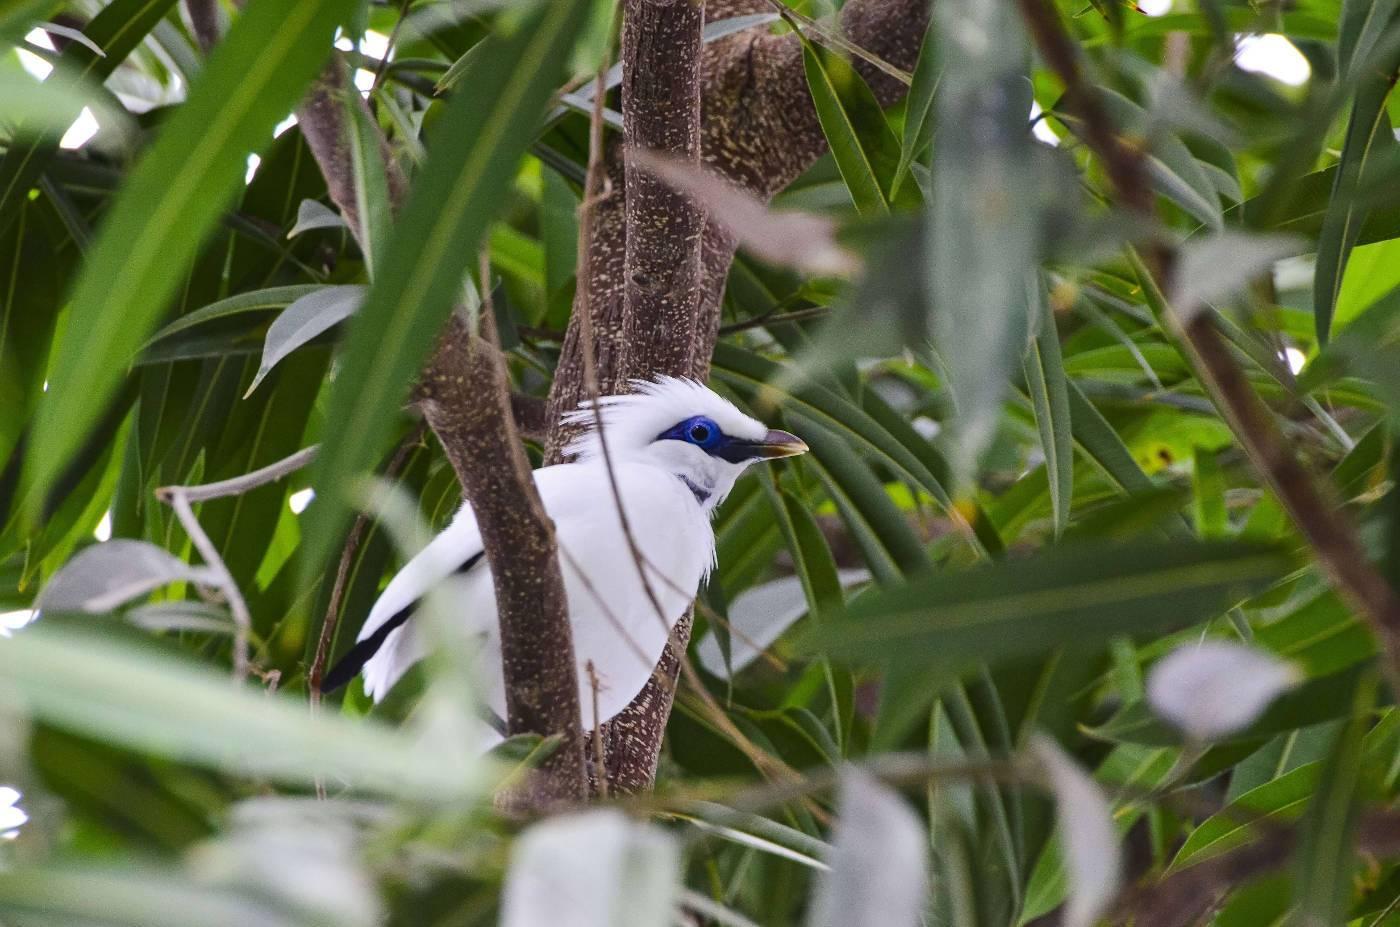 Curig Bali conservation